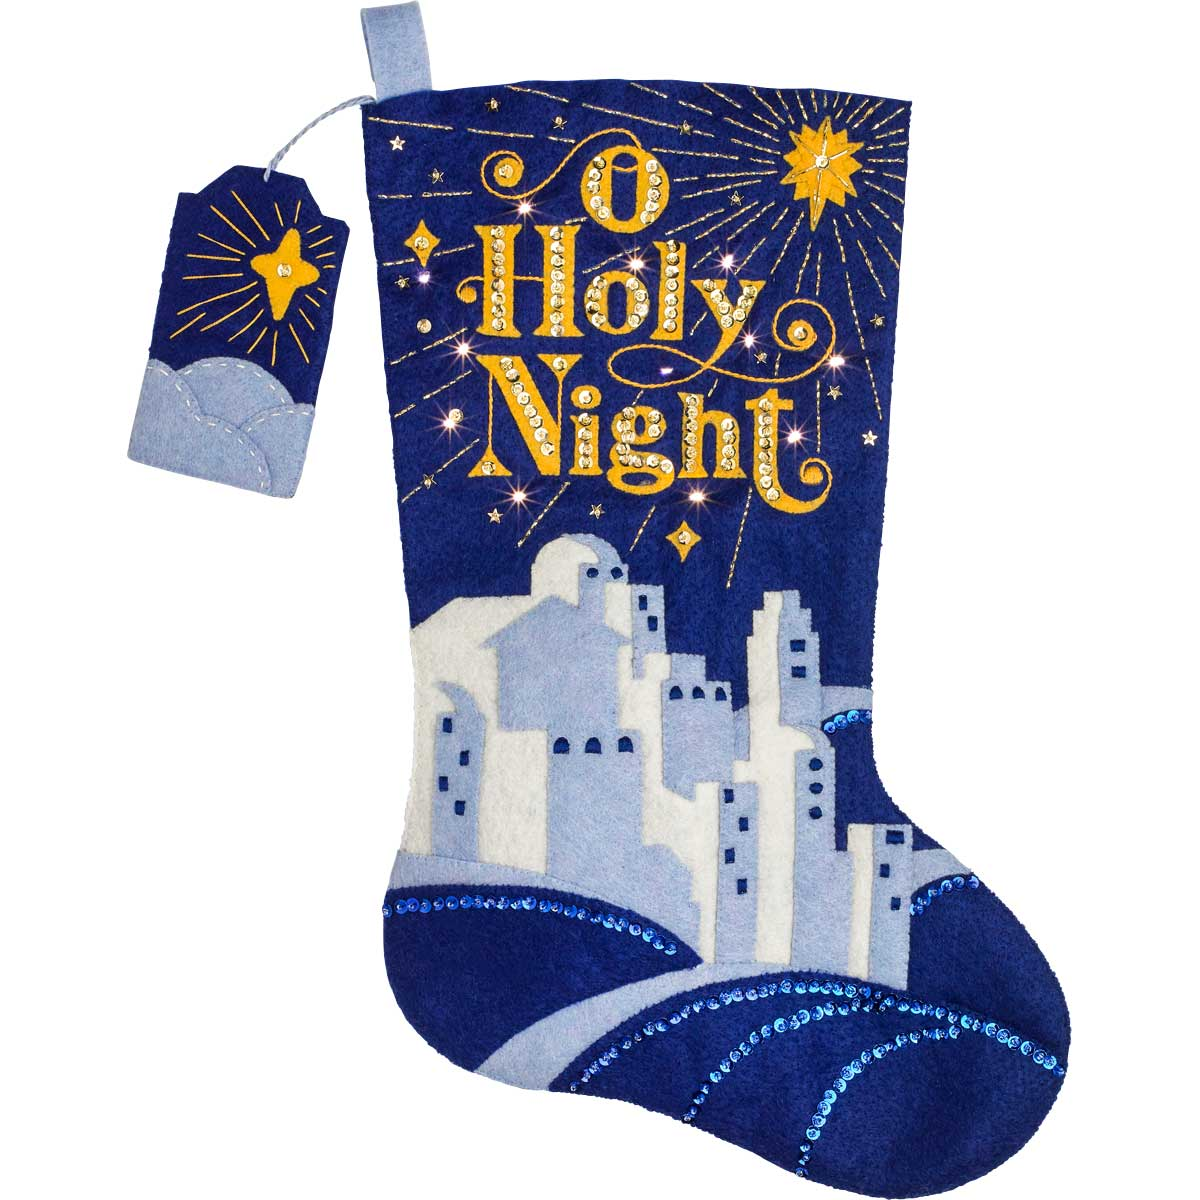 Bucilla ® Seasonal - Felt - Stocking Kits - DaySpring - O Holy Night with Lights - 86888E